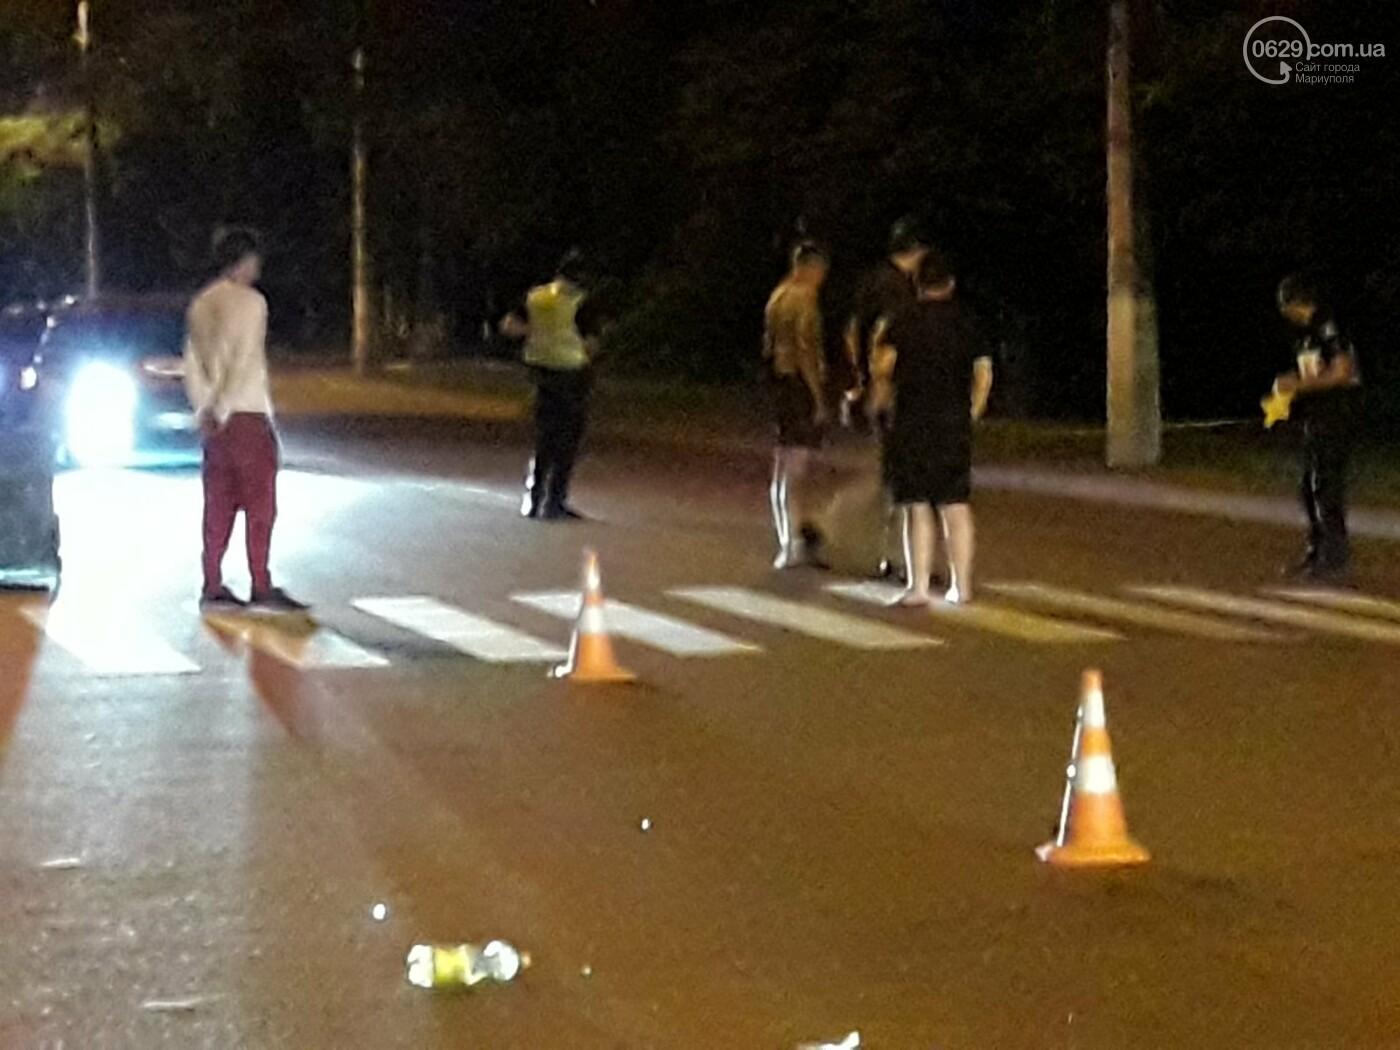 В центре Мариуполя на «зебре» Chevrolet сбил девушку, - ФОТО, ВИДЕО, фото-2